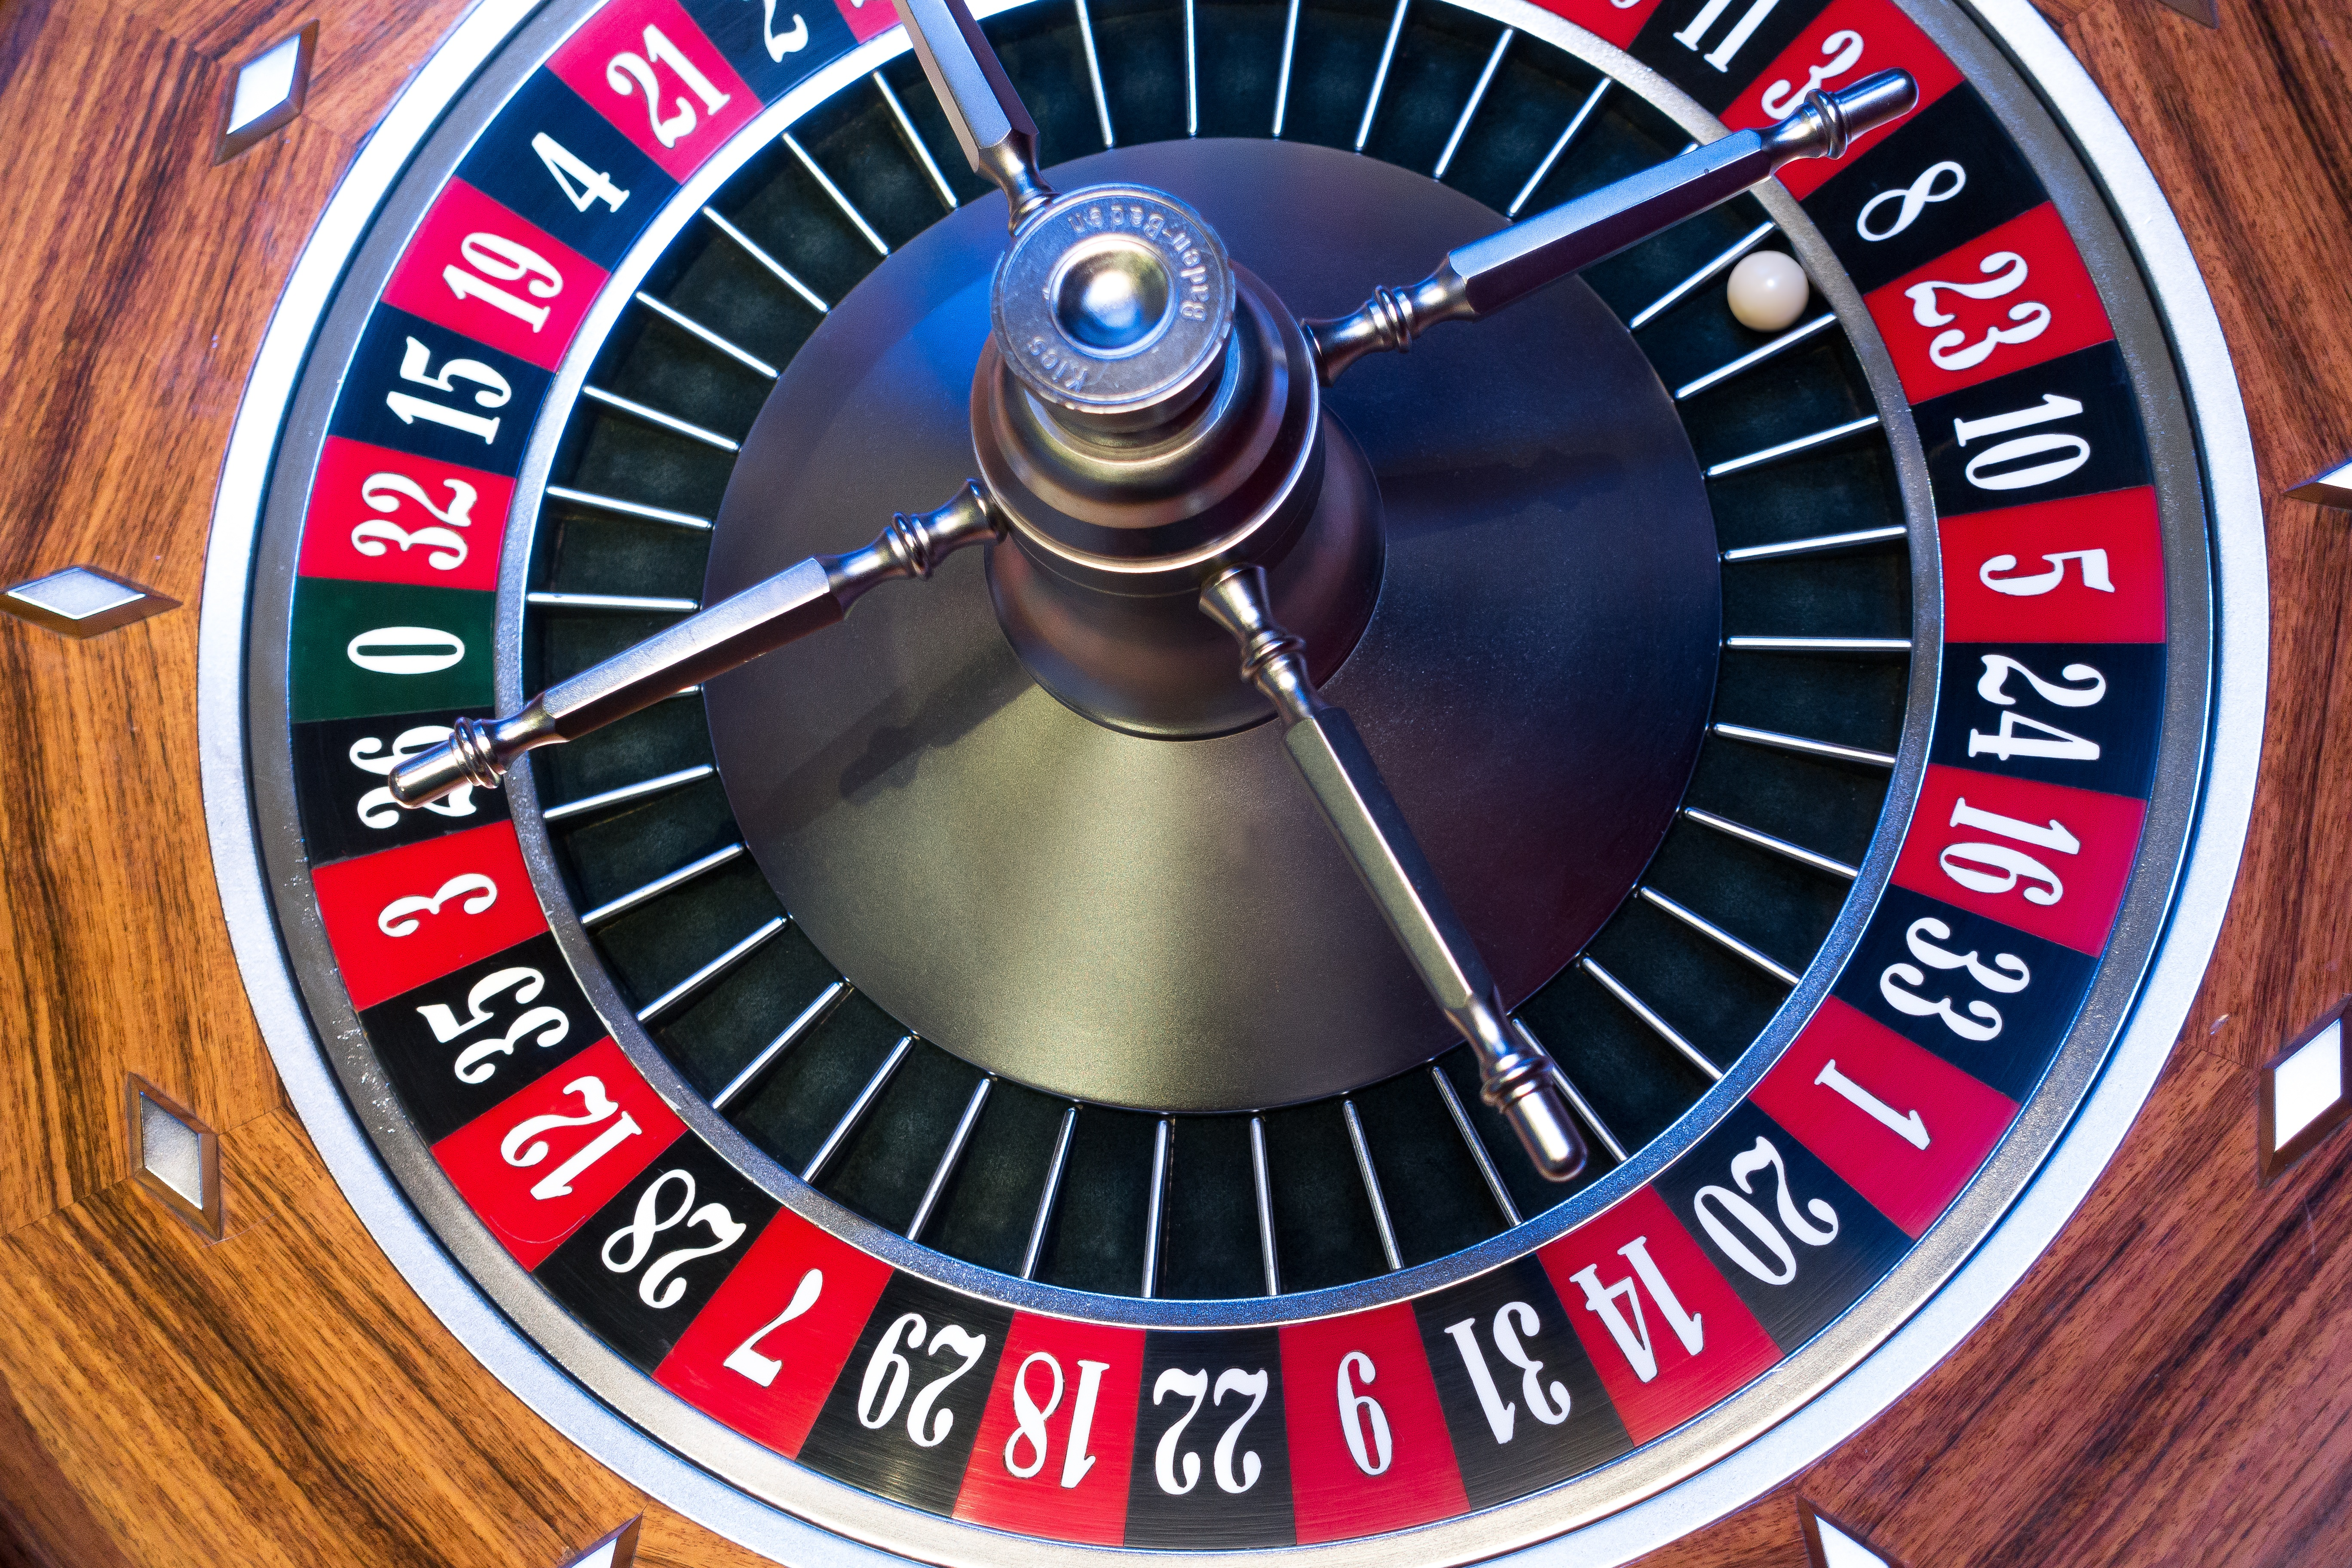 Reel Time Casino Nights